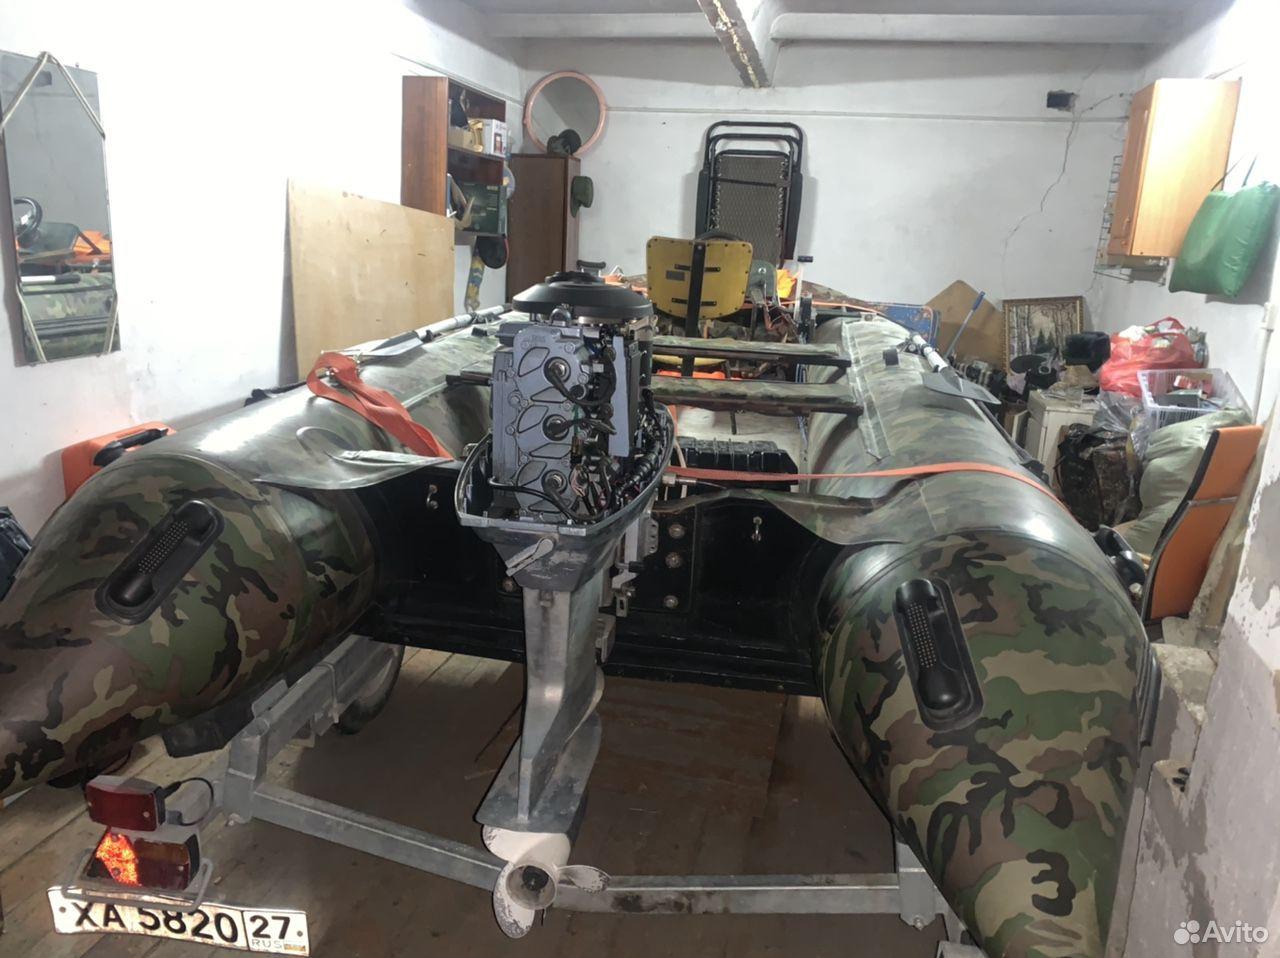 Продам мотор Ямаха 40 л.с